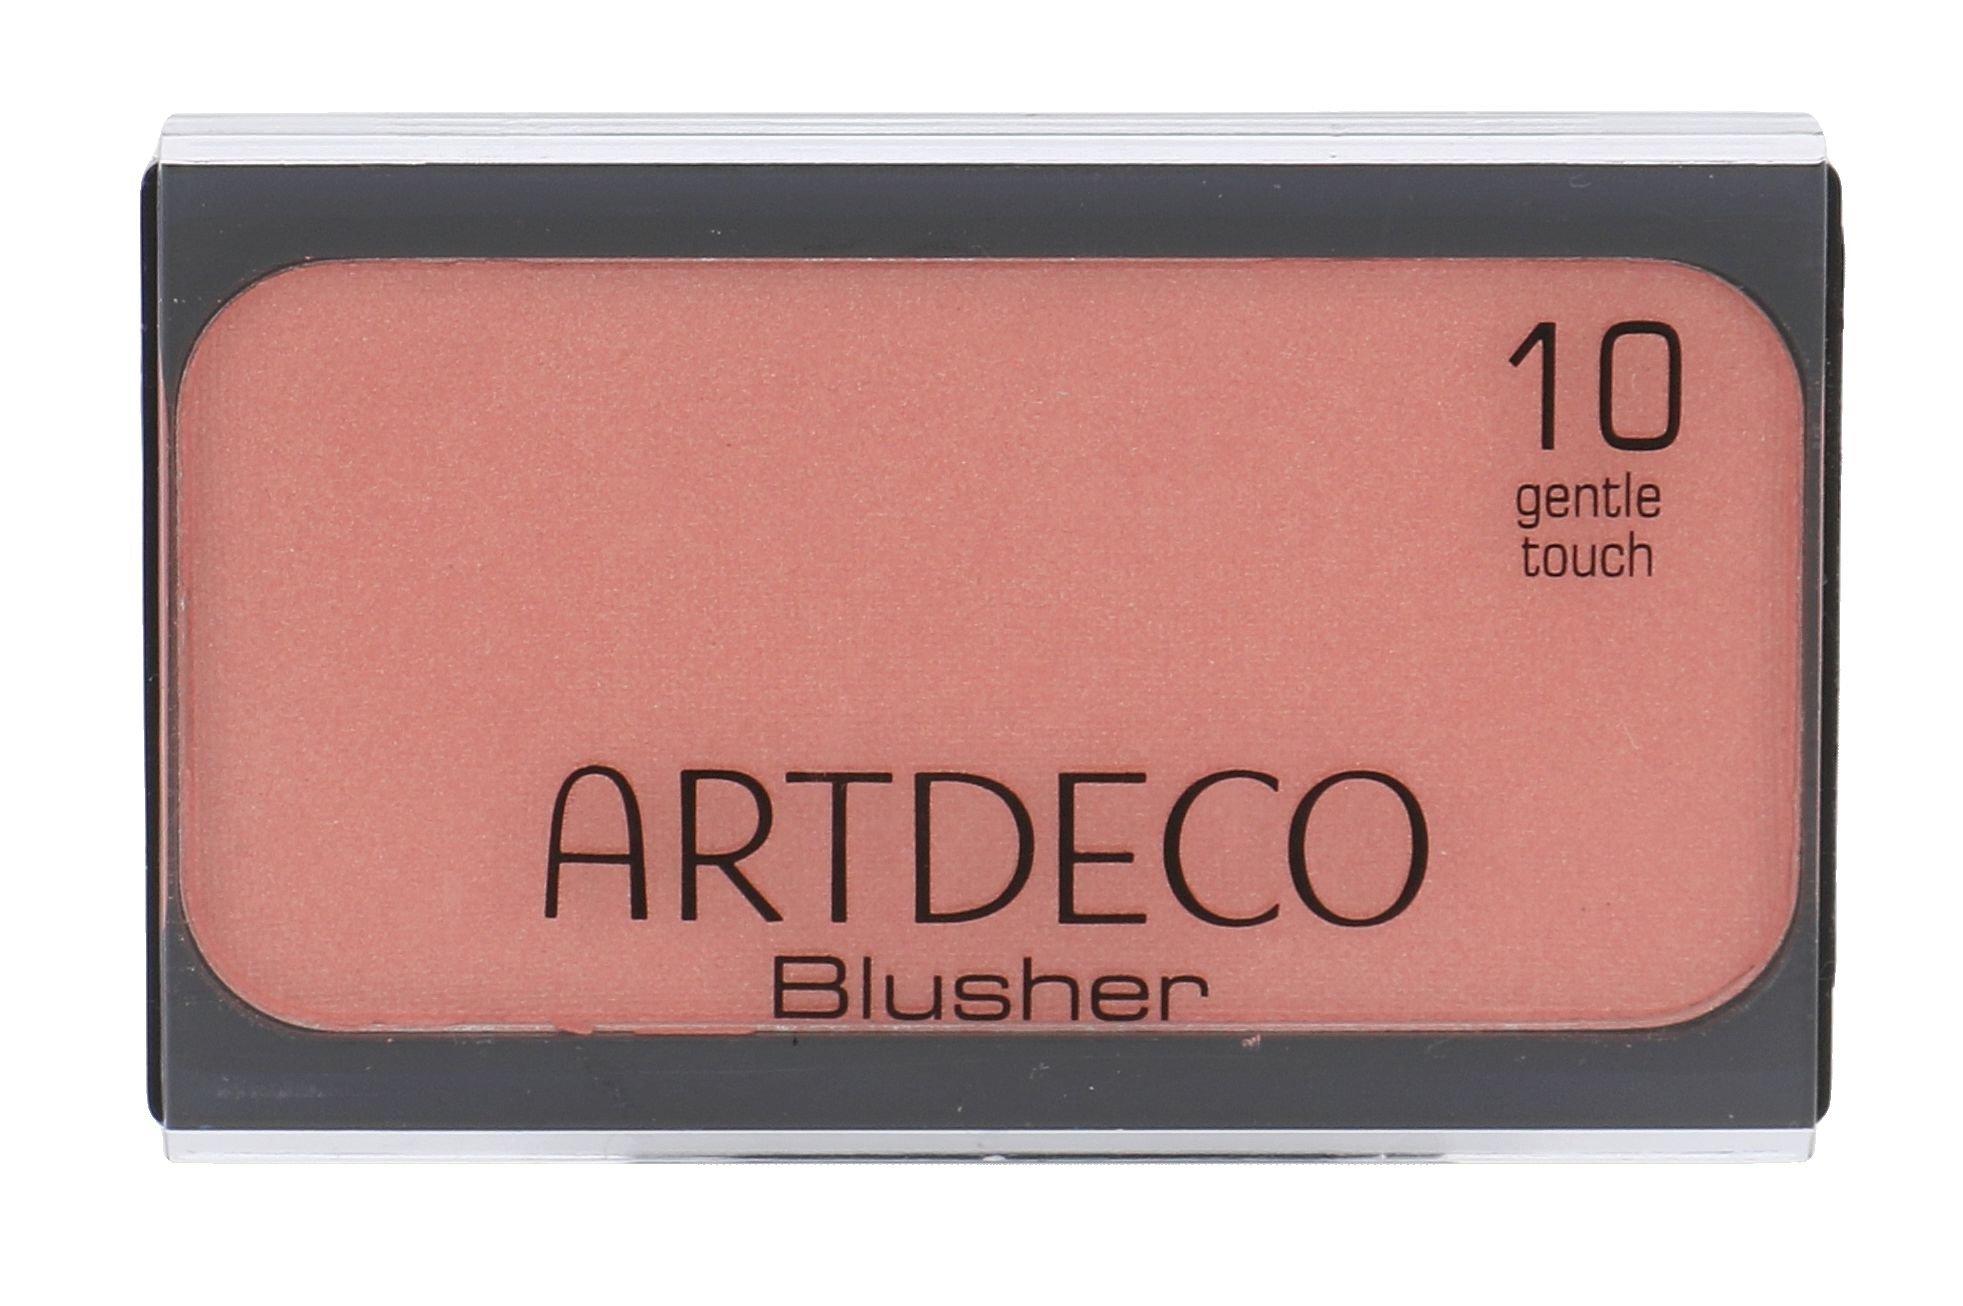 Artdeco Blusher Cosmetic 5ml 10 Gentle Touch